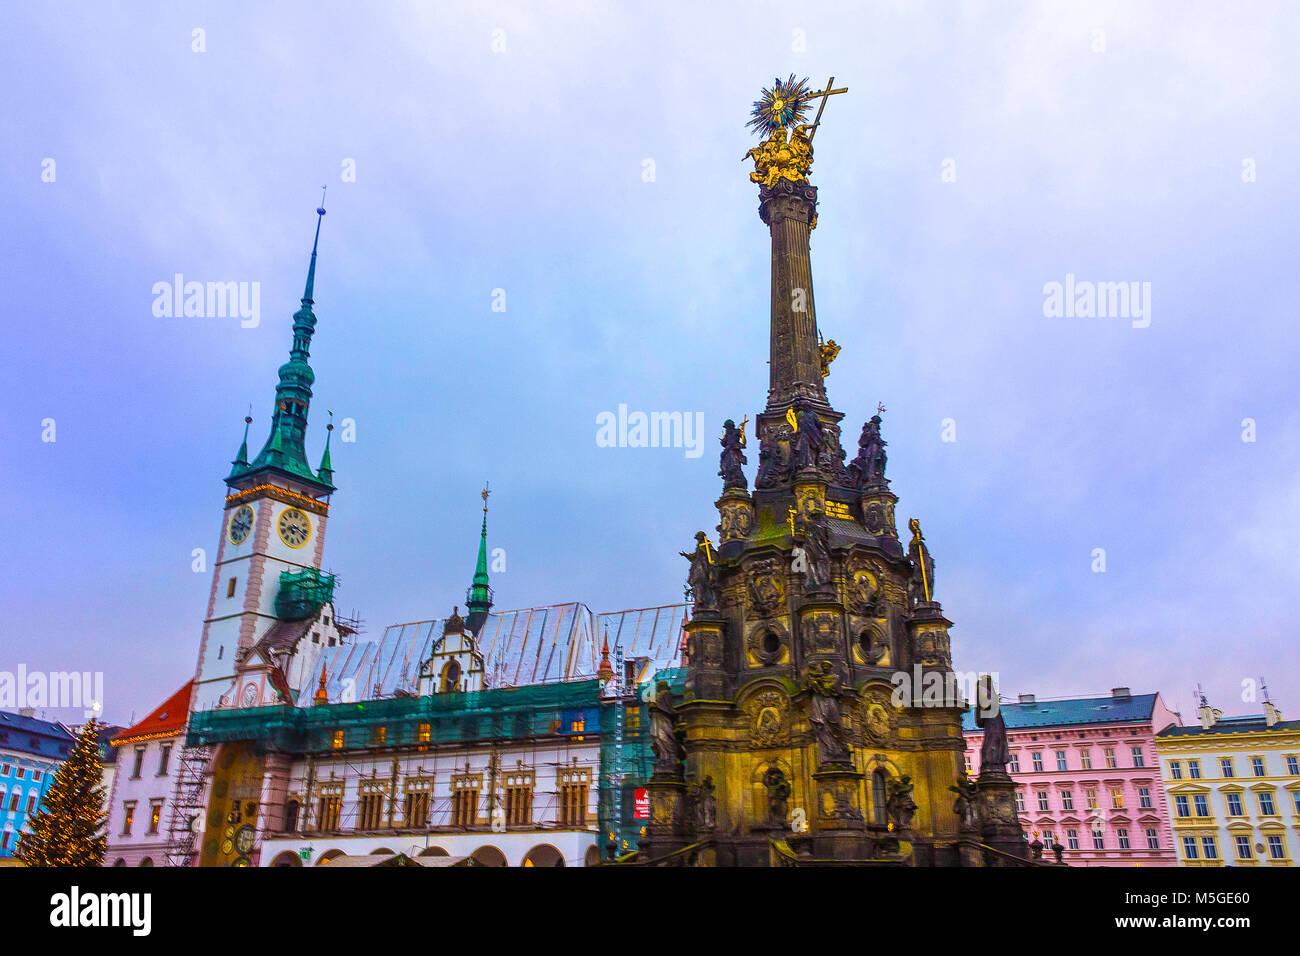 Olomouc, Cszech Republic - January 02, 2018: The city model sculpture in the Olomouc, Bohemia, Czech republic, Europe. - Stock Image